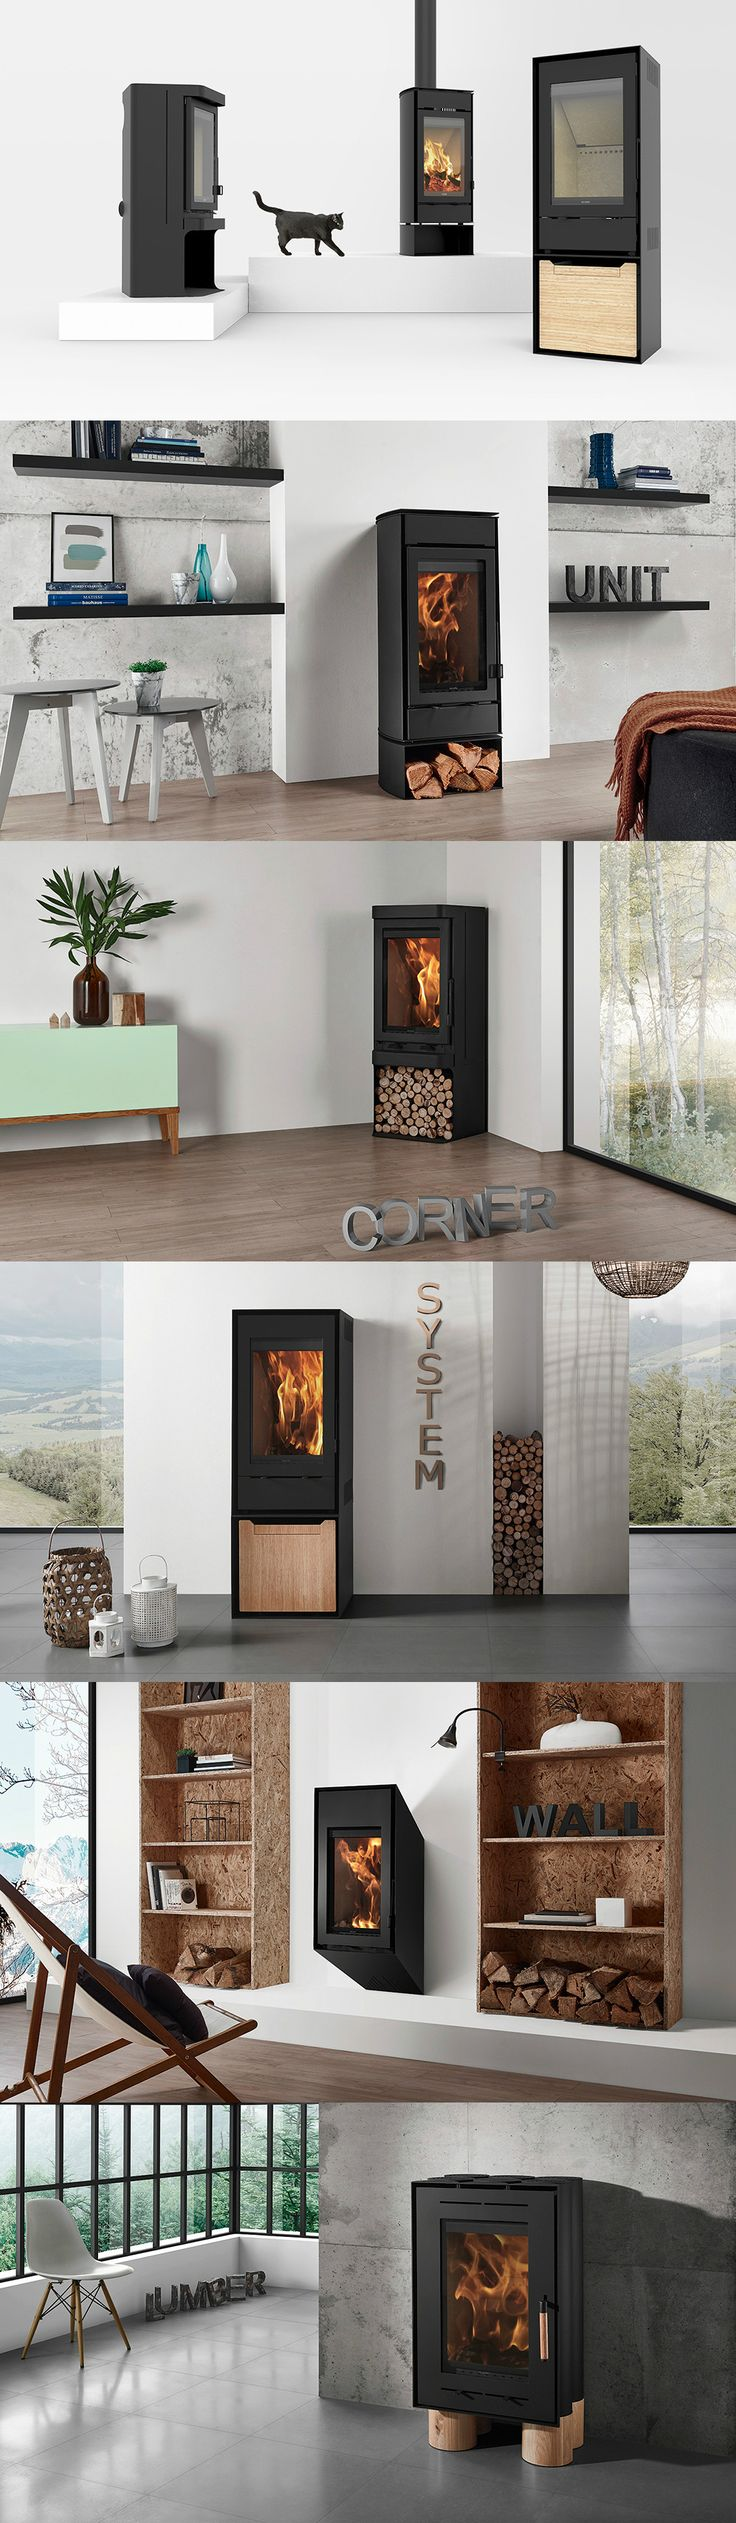 399 best pellet wood stoves images on pinterest wood stoves